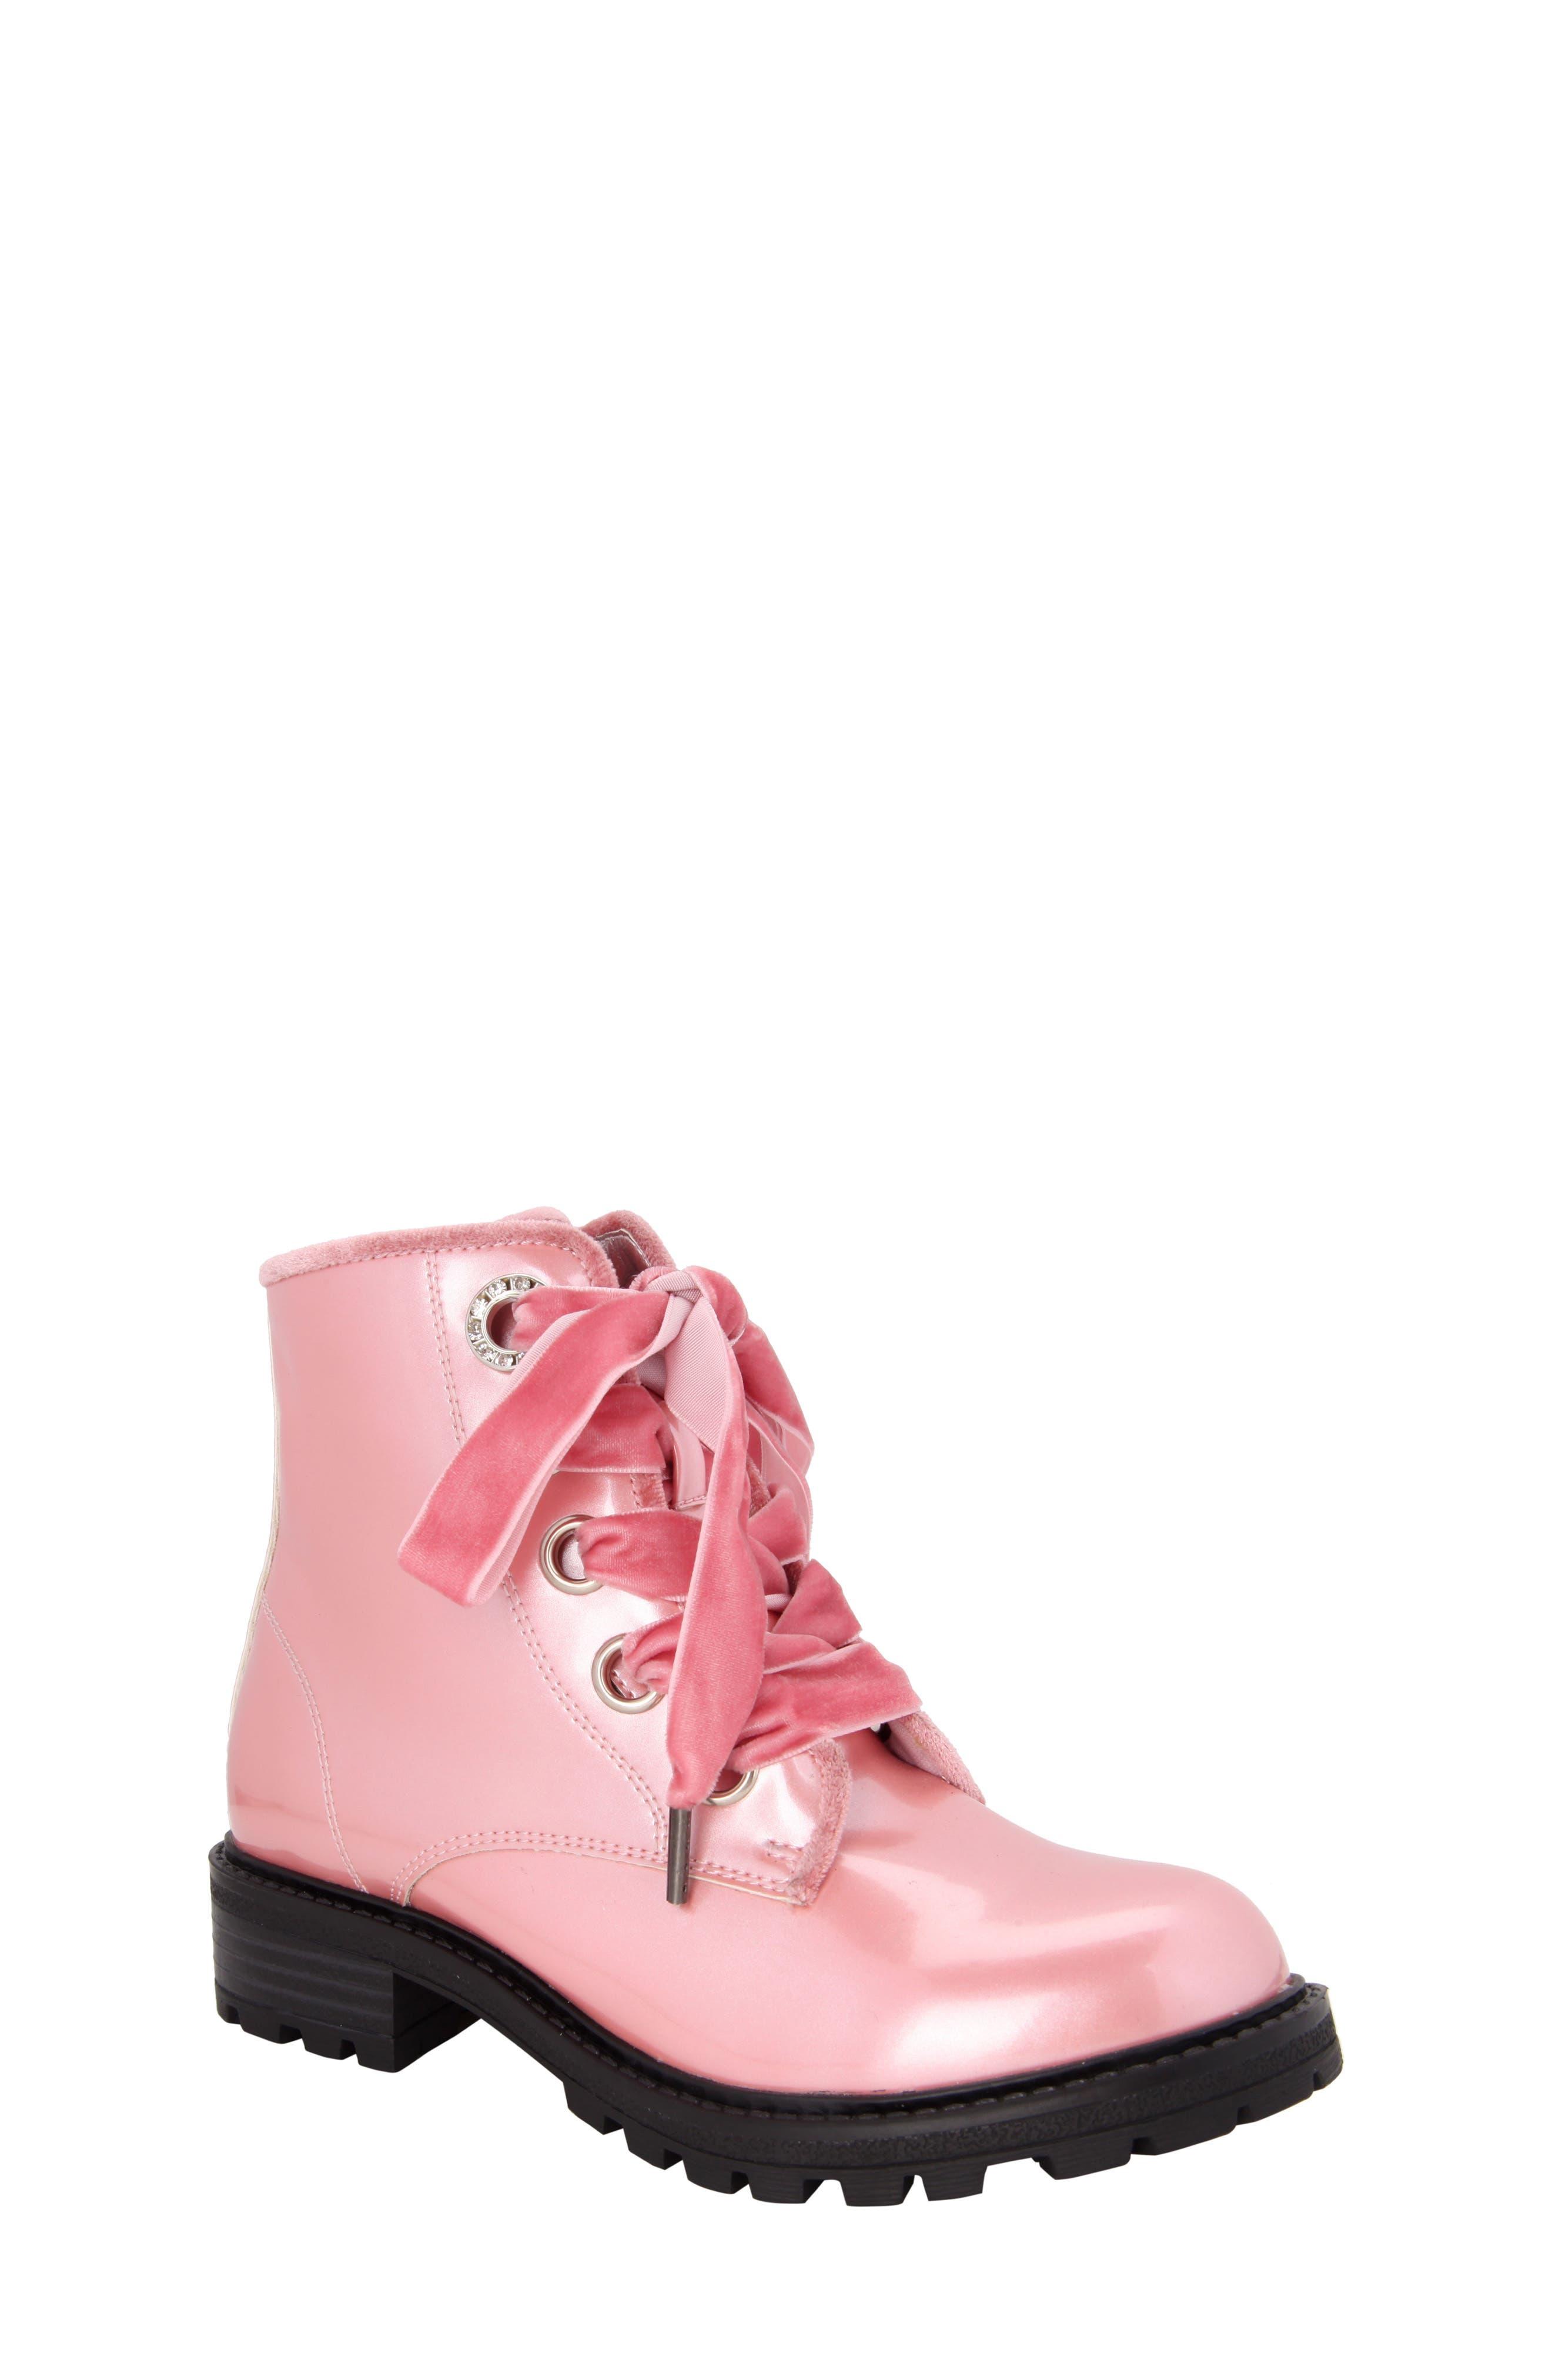 Alternate Image 1 Selected - Nina Cherrie Lugged Patent Boot (Toddler, Little Kid & Big Kid)